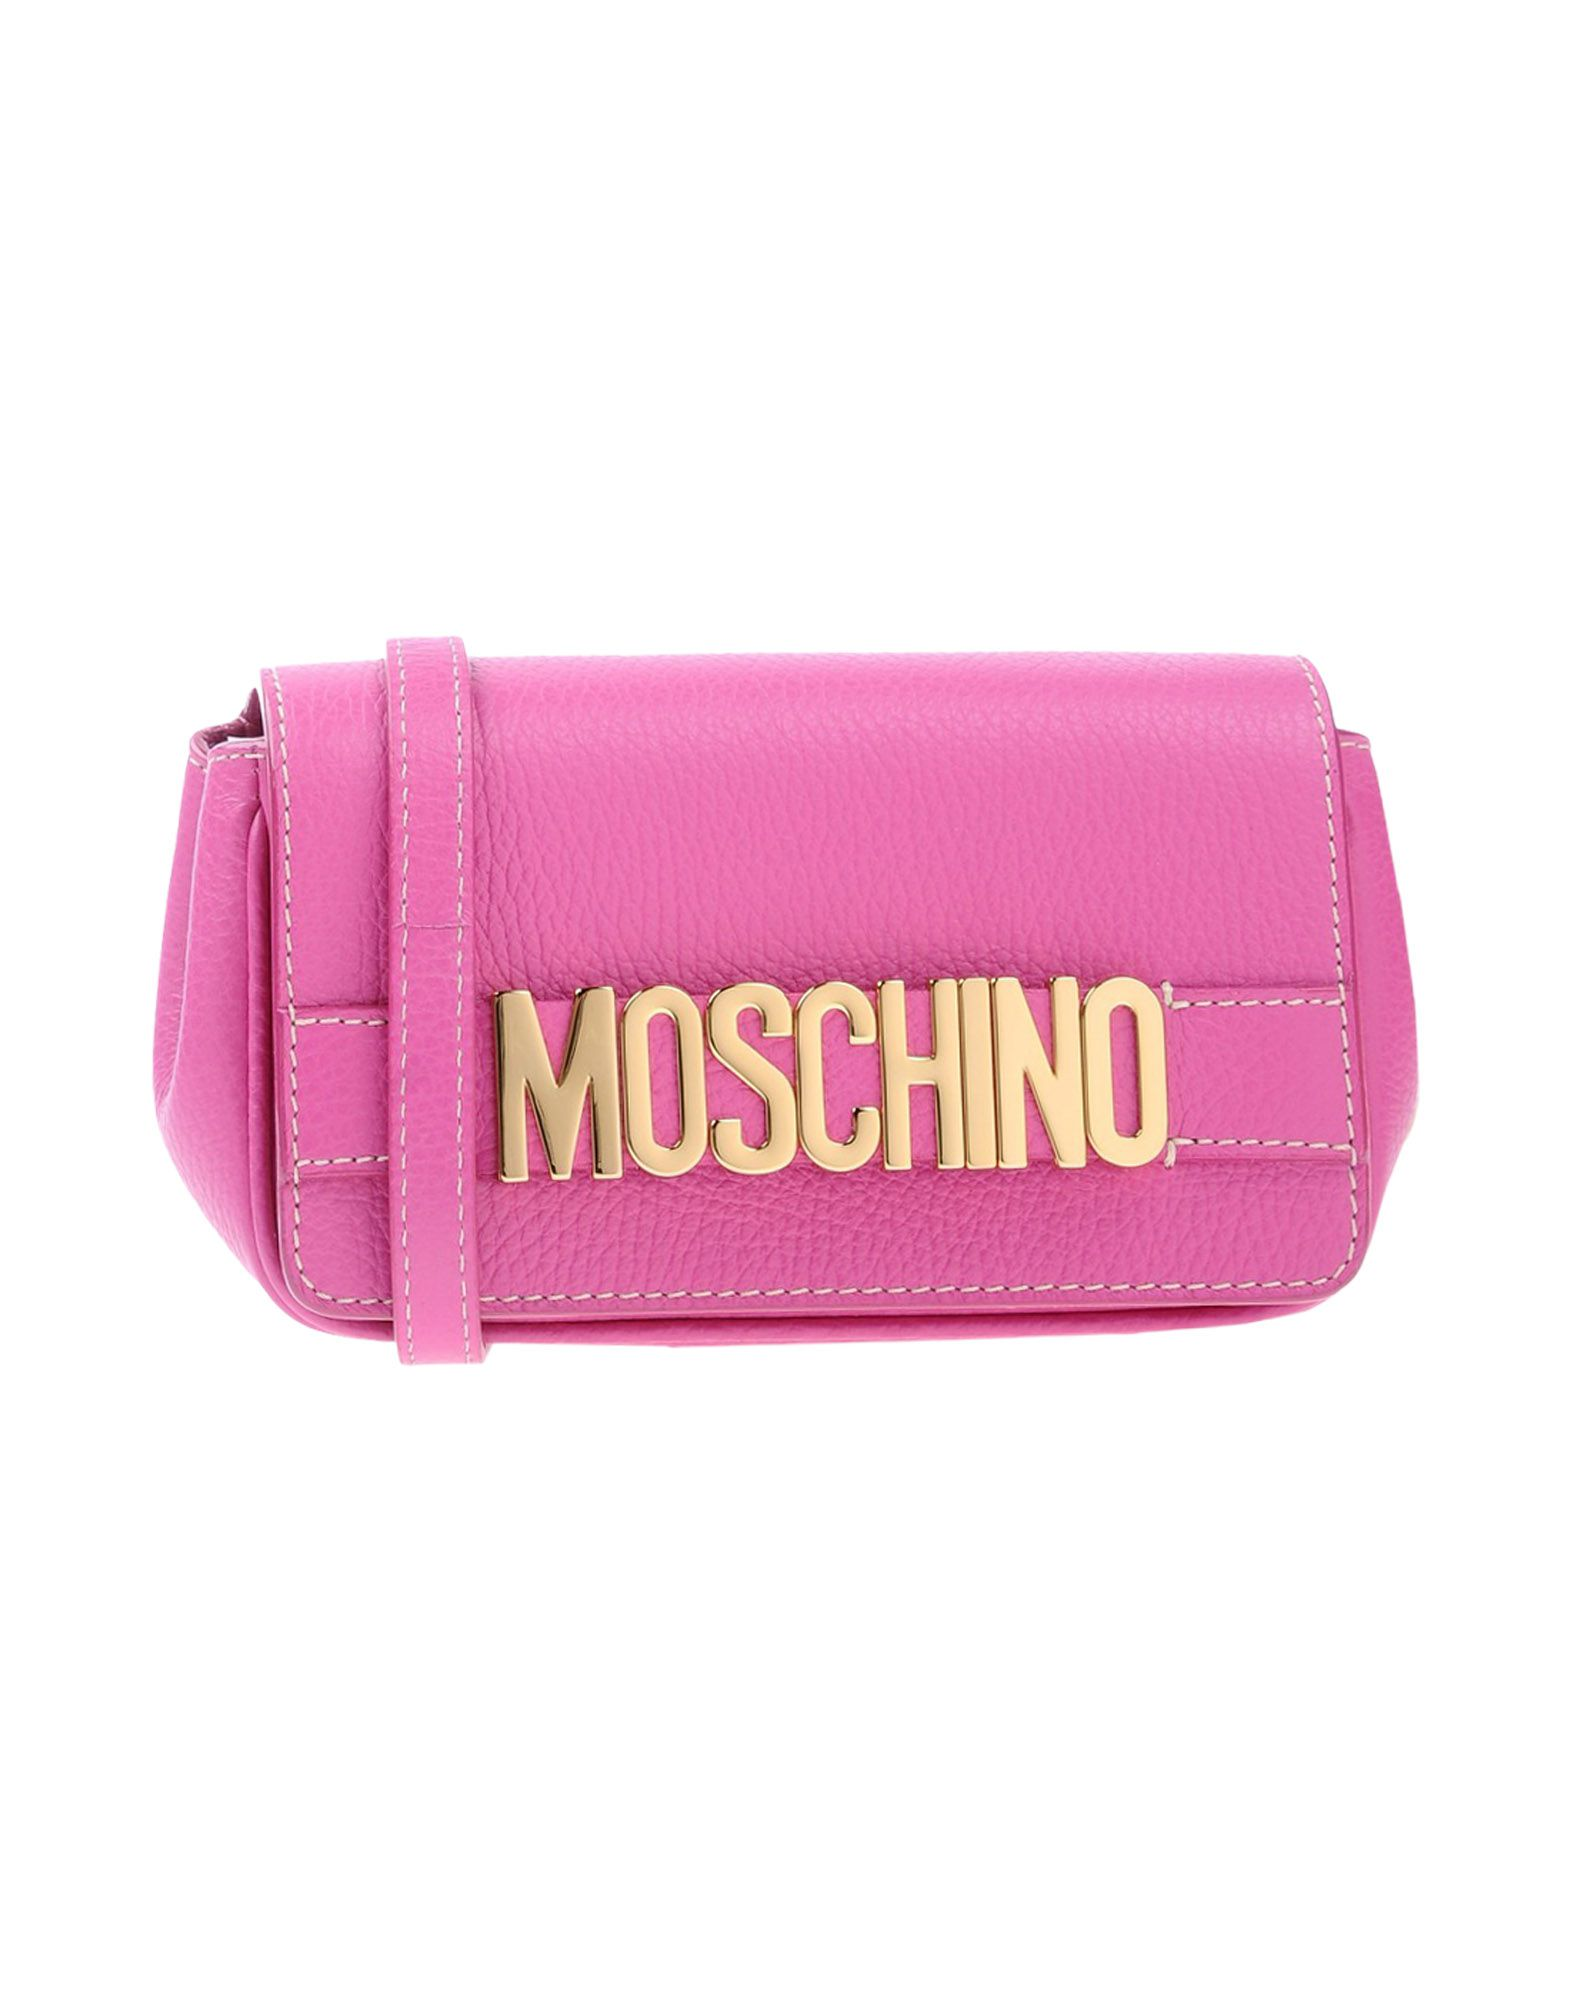 MOSCHINO Сумка через плечо love moschino сумка через плечо